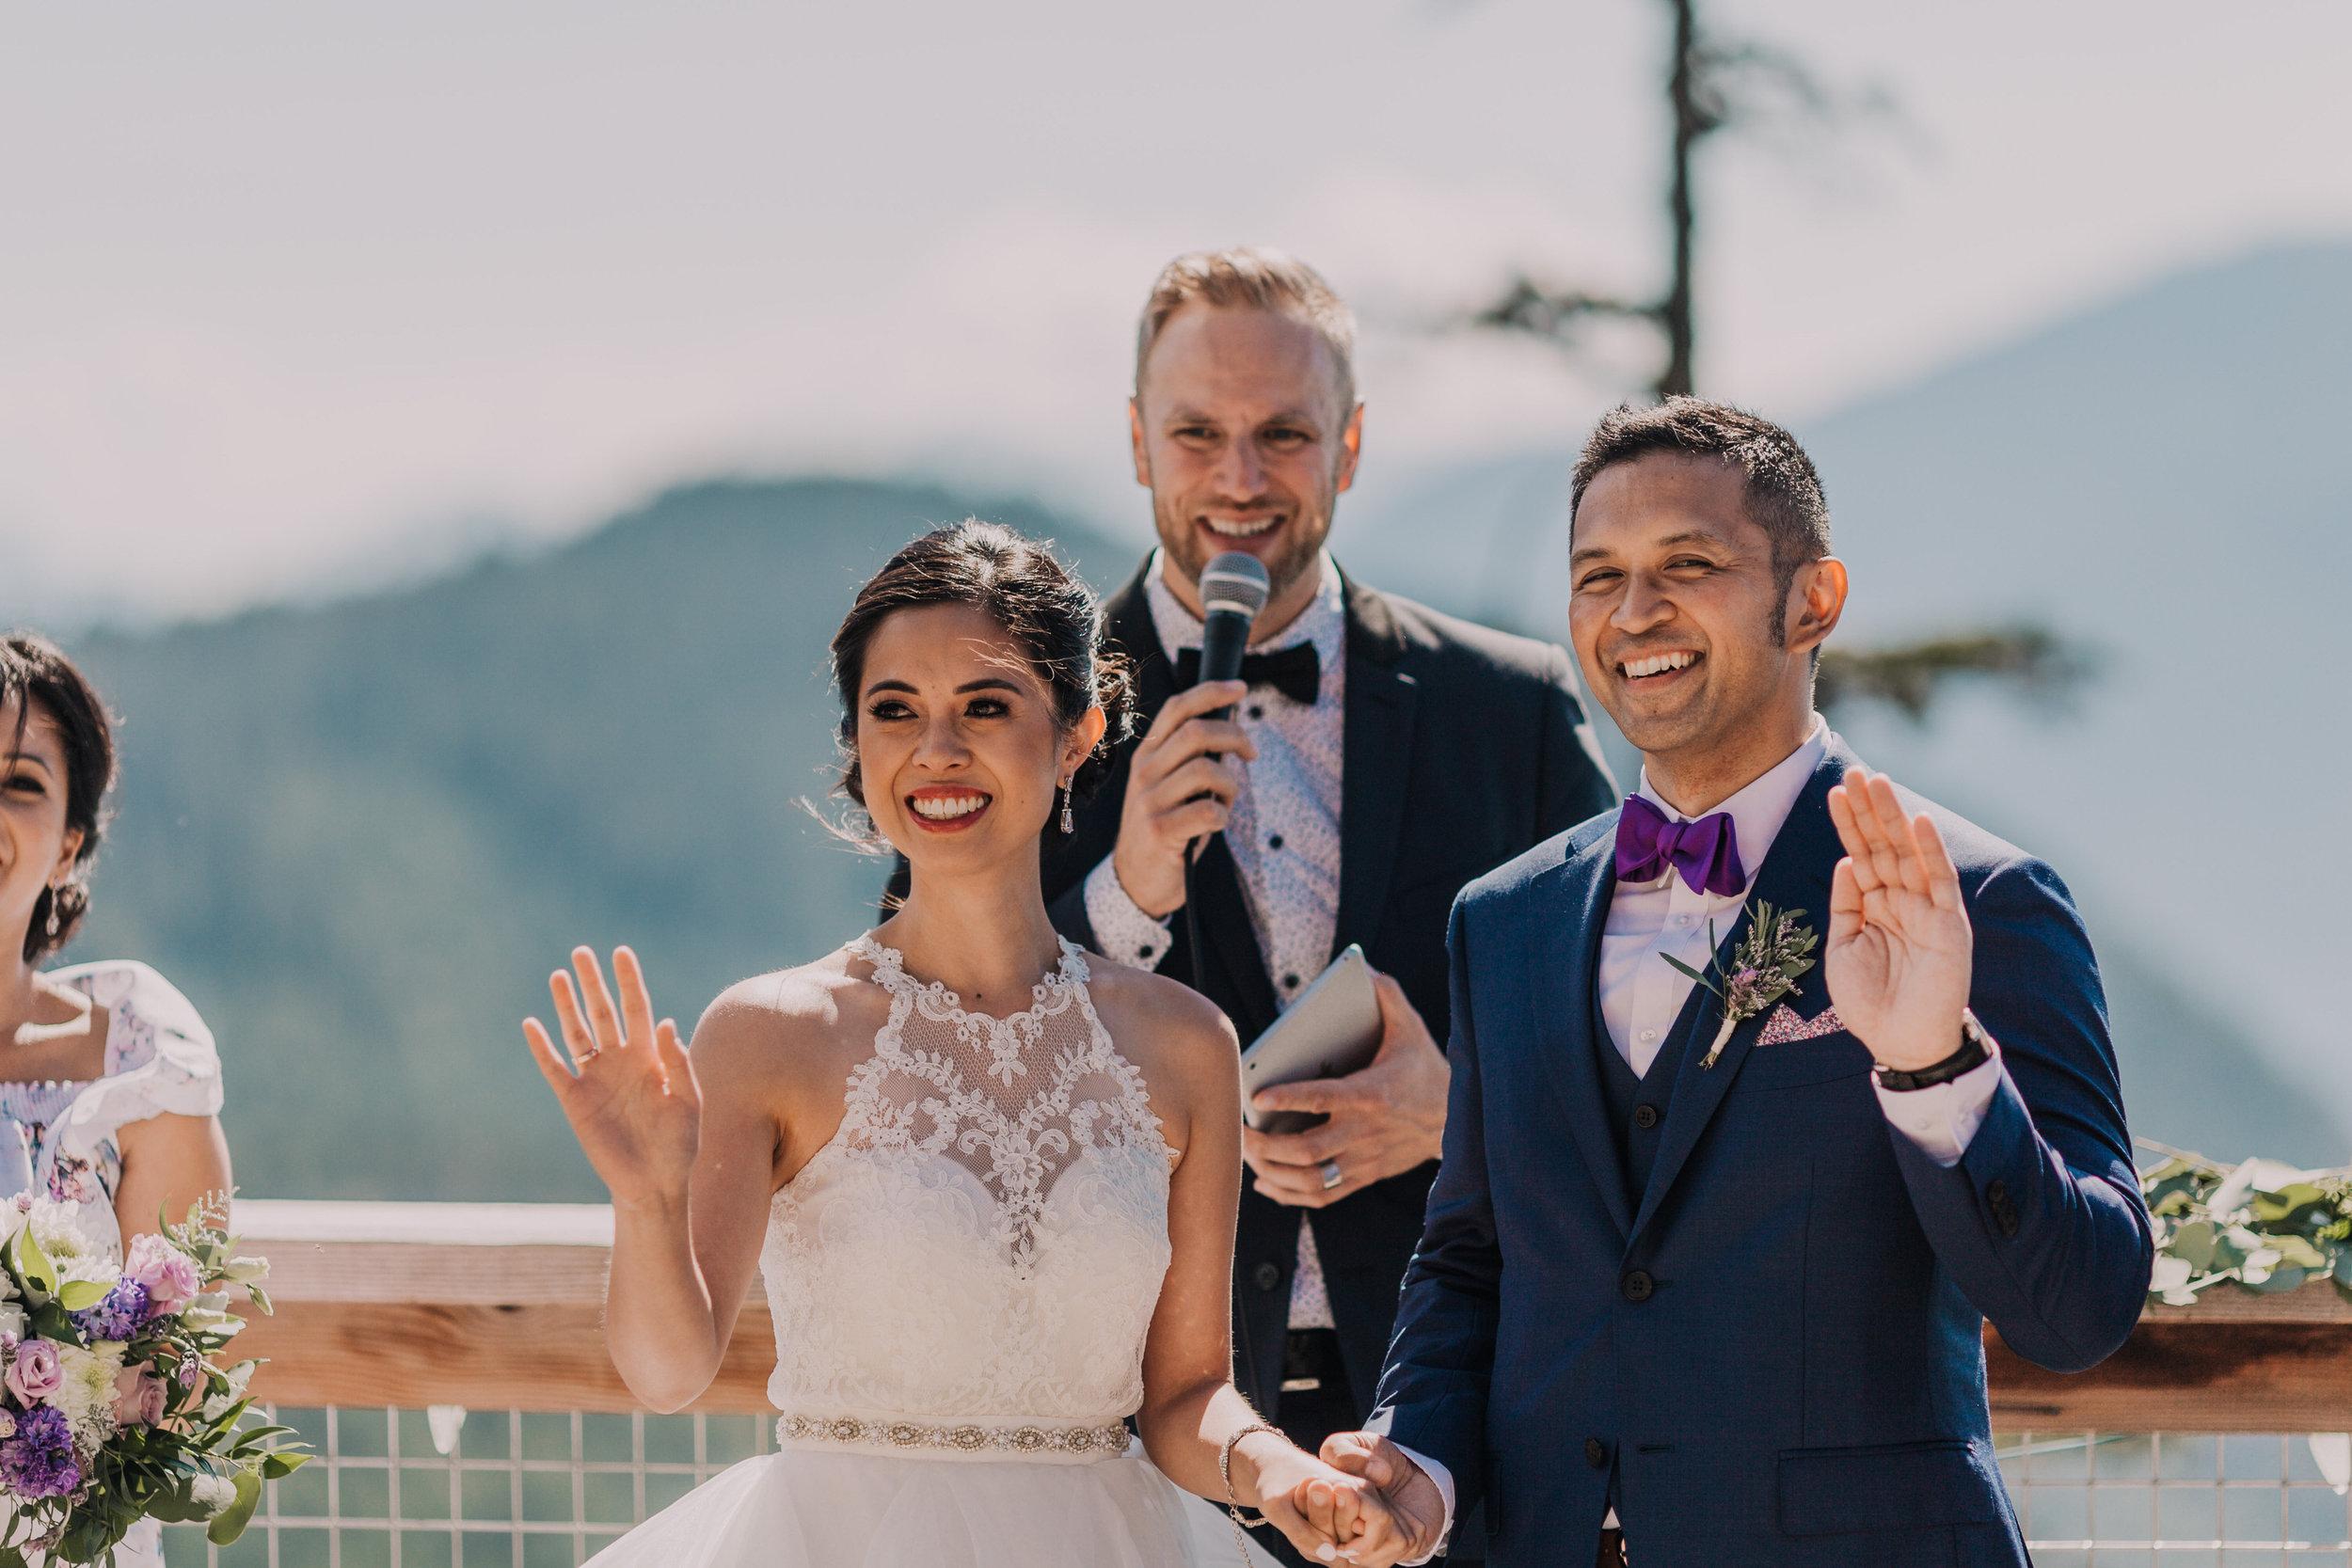 Squamish Wedding Photographer - Sea to Sky Gondola Wedding Photos -  Vancouver Wedding Photographer & Videographer - Sunshine Coast Wedding Photos - Sunshine Coast Wedding Photographer - Jennifer Picard Photography - IMG_0225.jpg